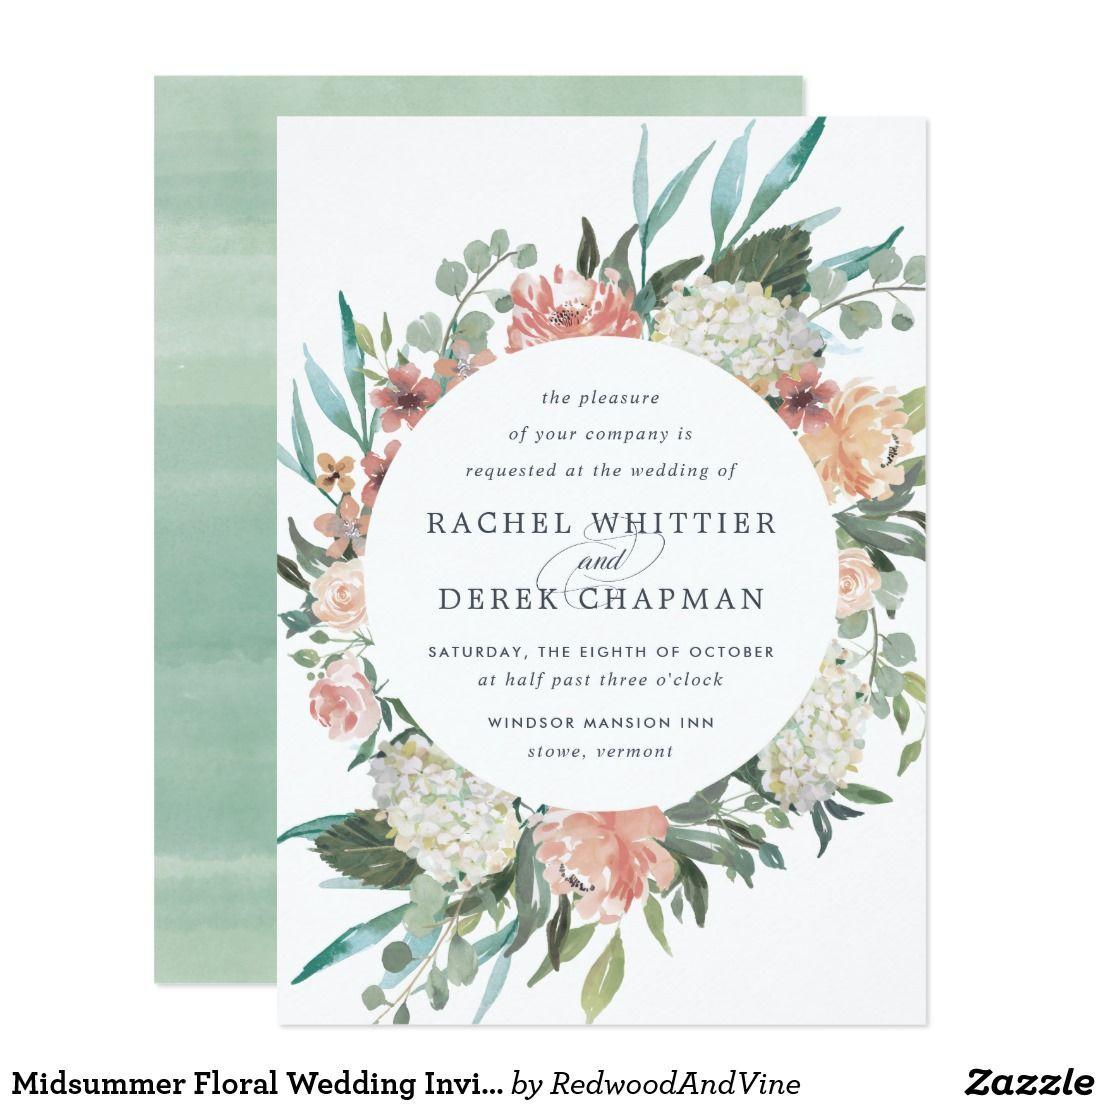 Midsummer Floral Wedding Invitation Elegant floral wedding ...